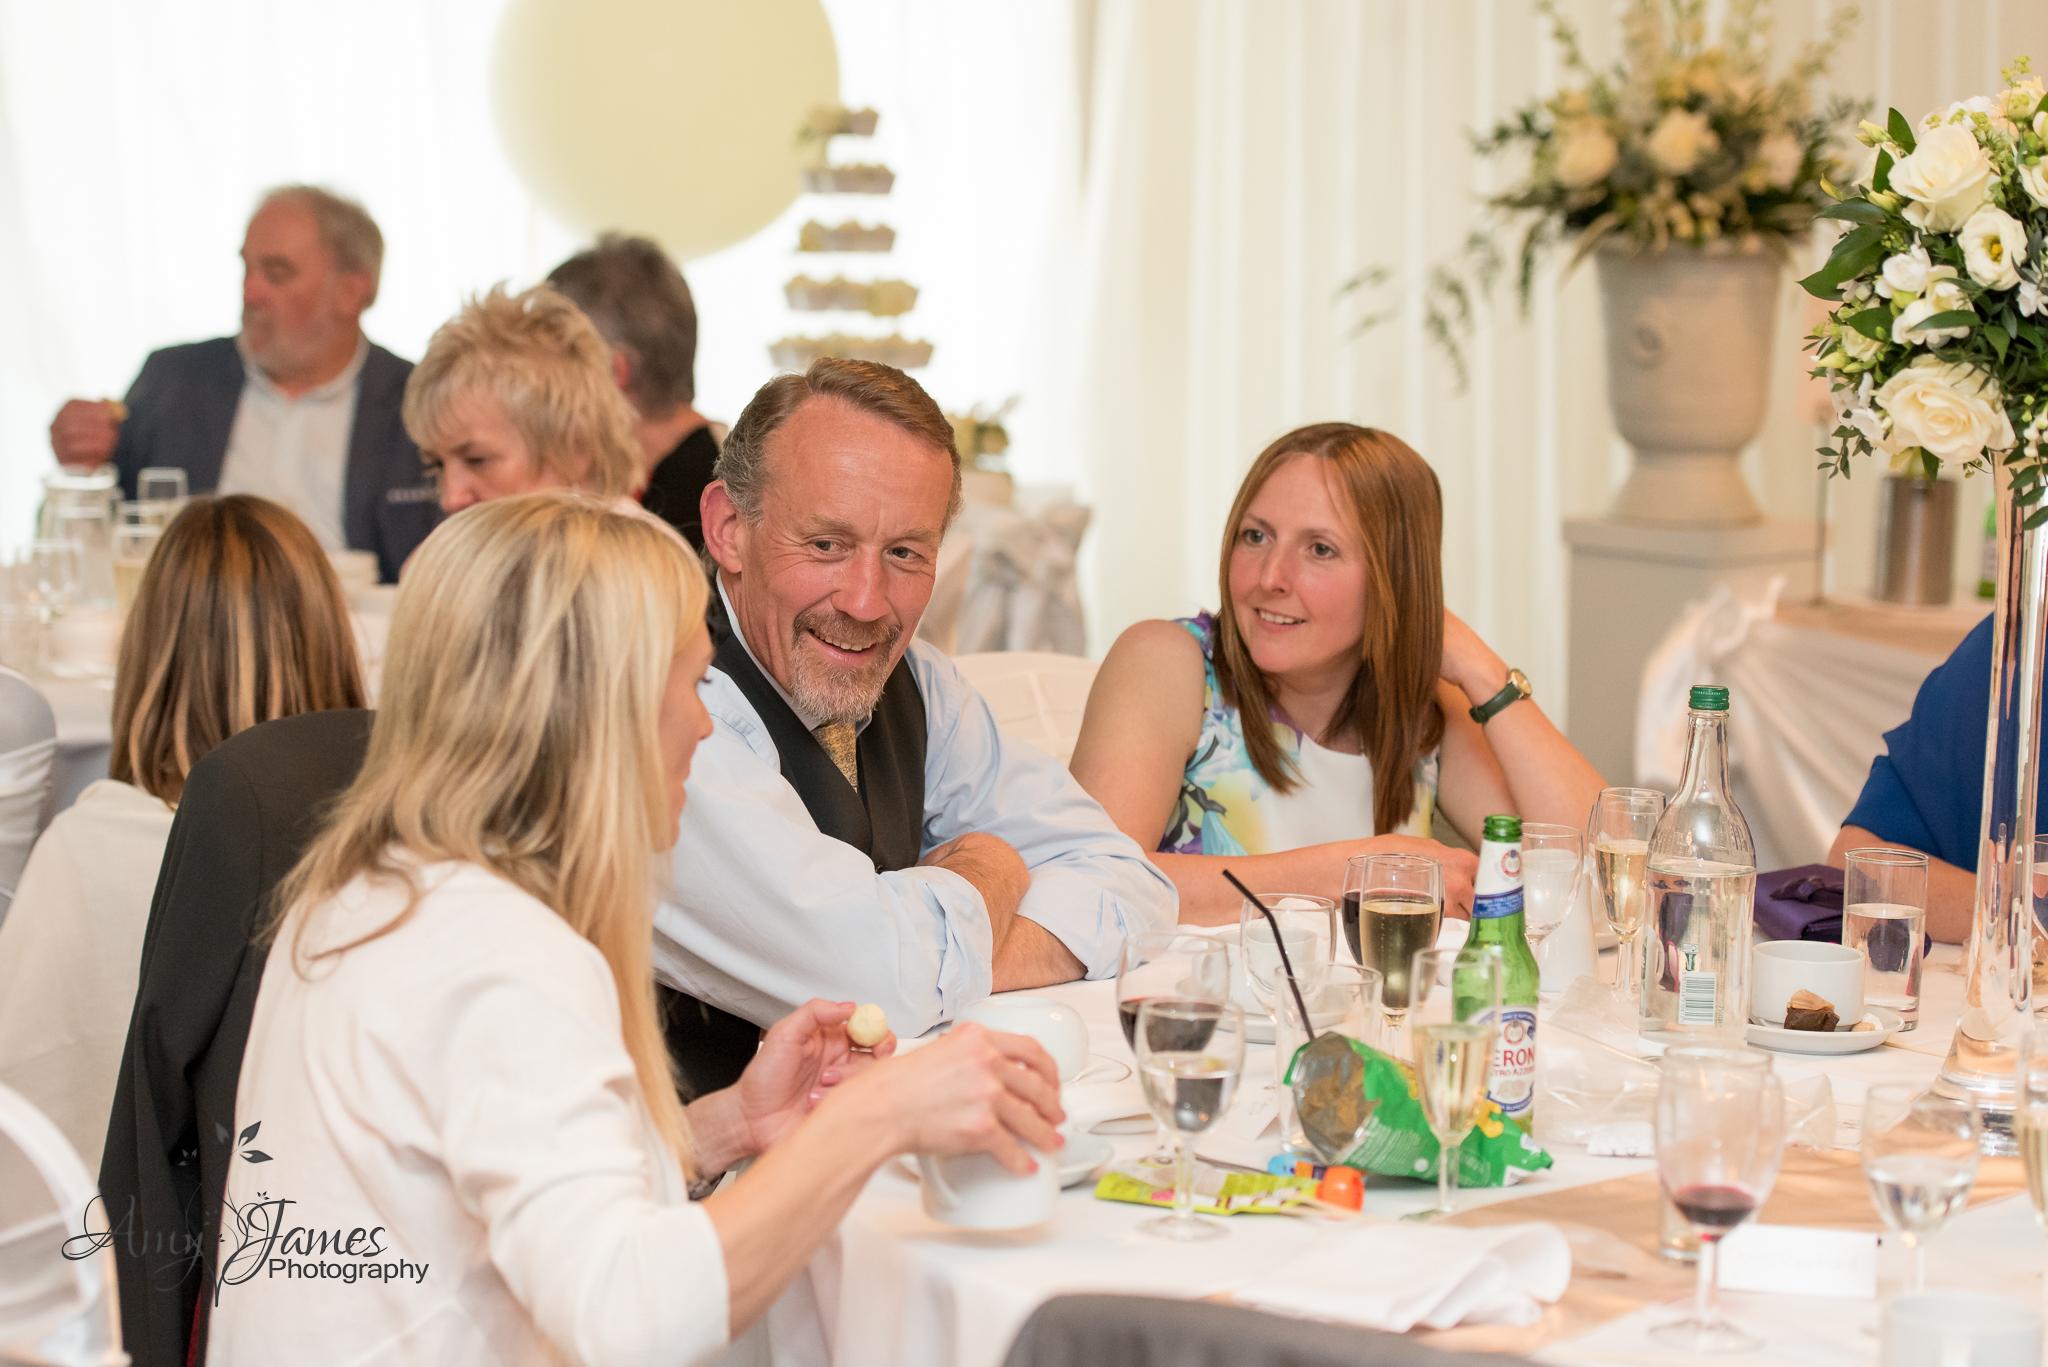 Amy James Photography / Hampshire wedding venues / Wedding photographer Hampshire / Surrey Wedding venues / Audleys Wood Hotel wedding